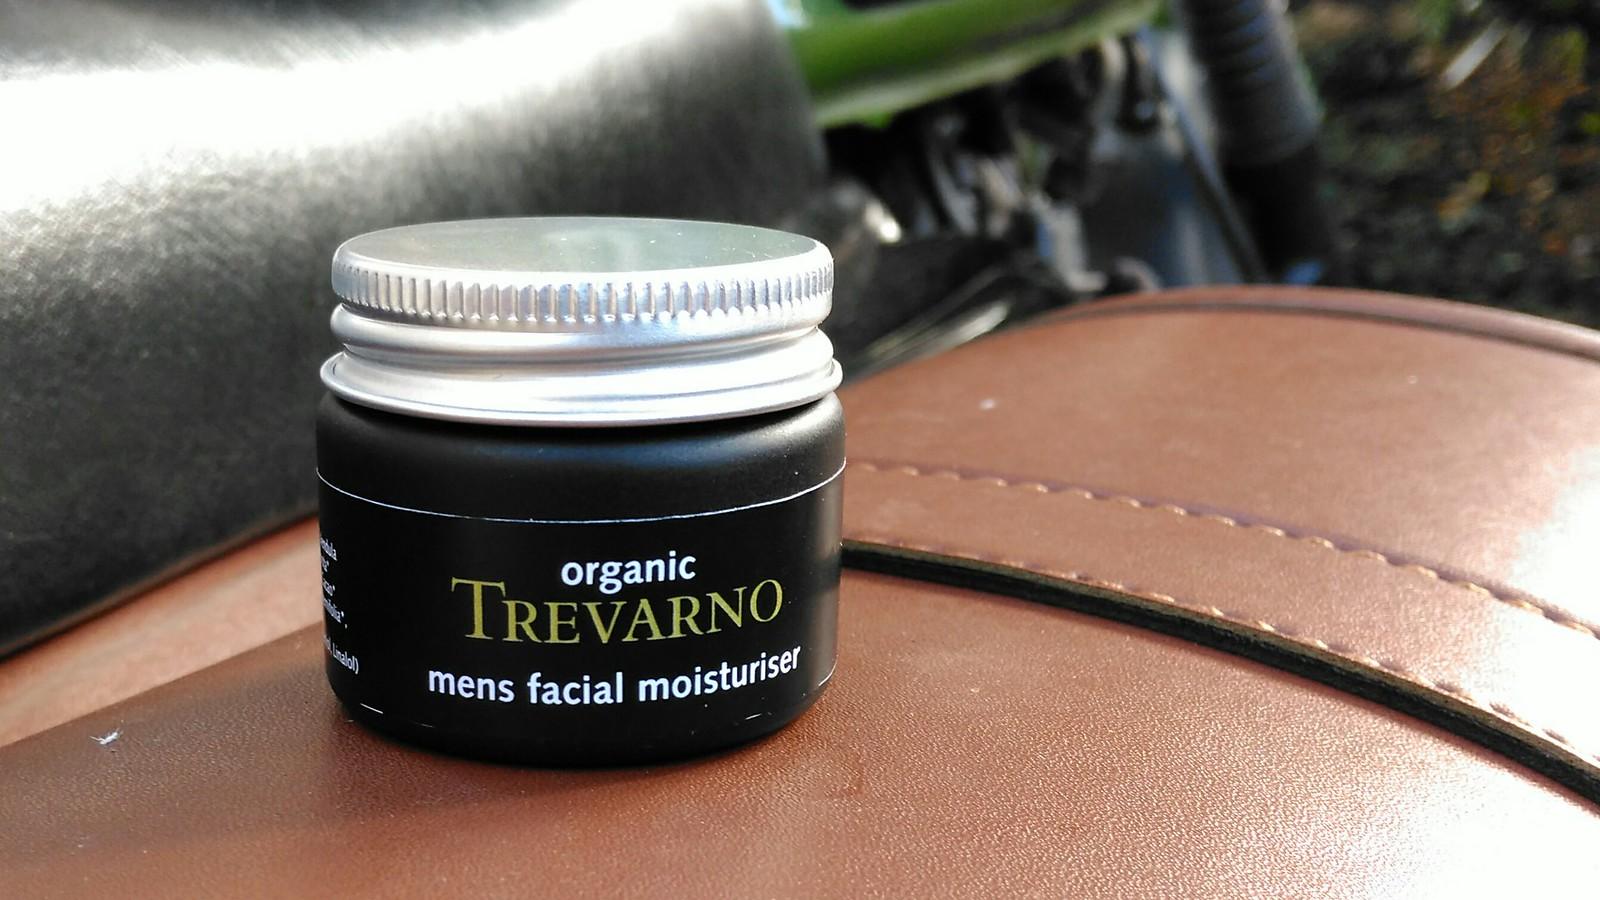 trevarno mens moisturizer